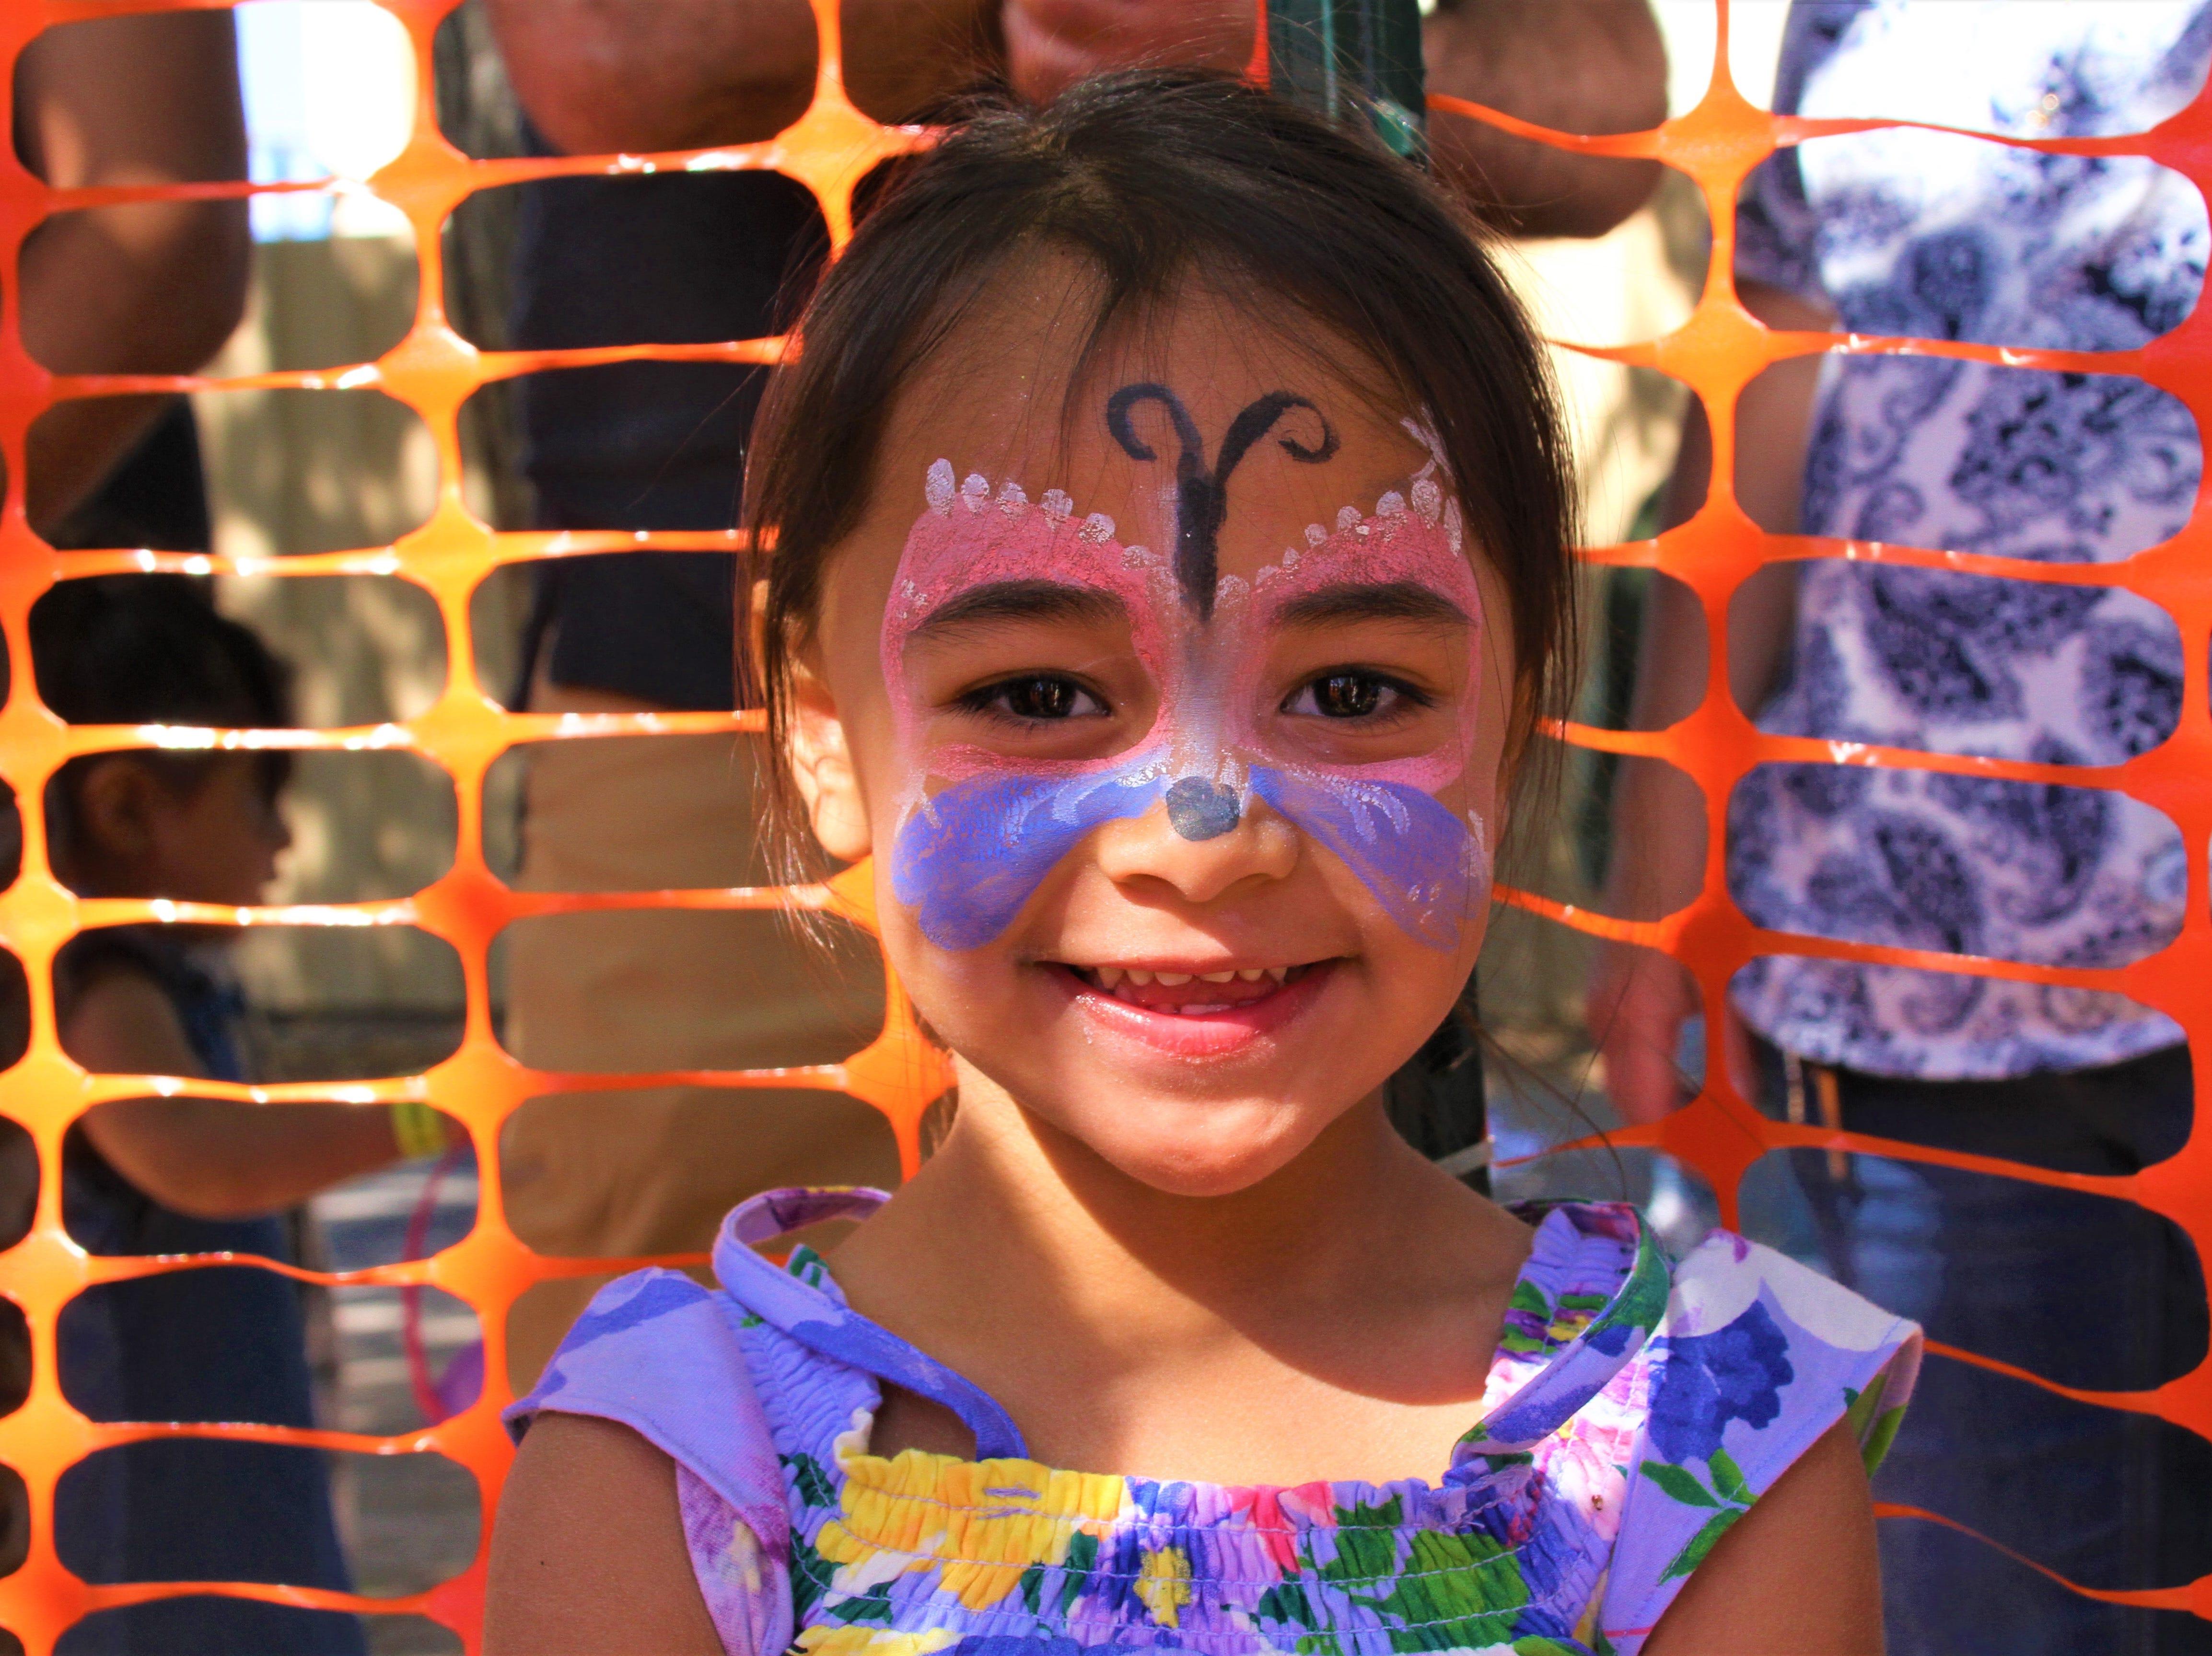 Zaeleigh Rubalcaba, 3, with butterfly face paint.